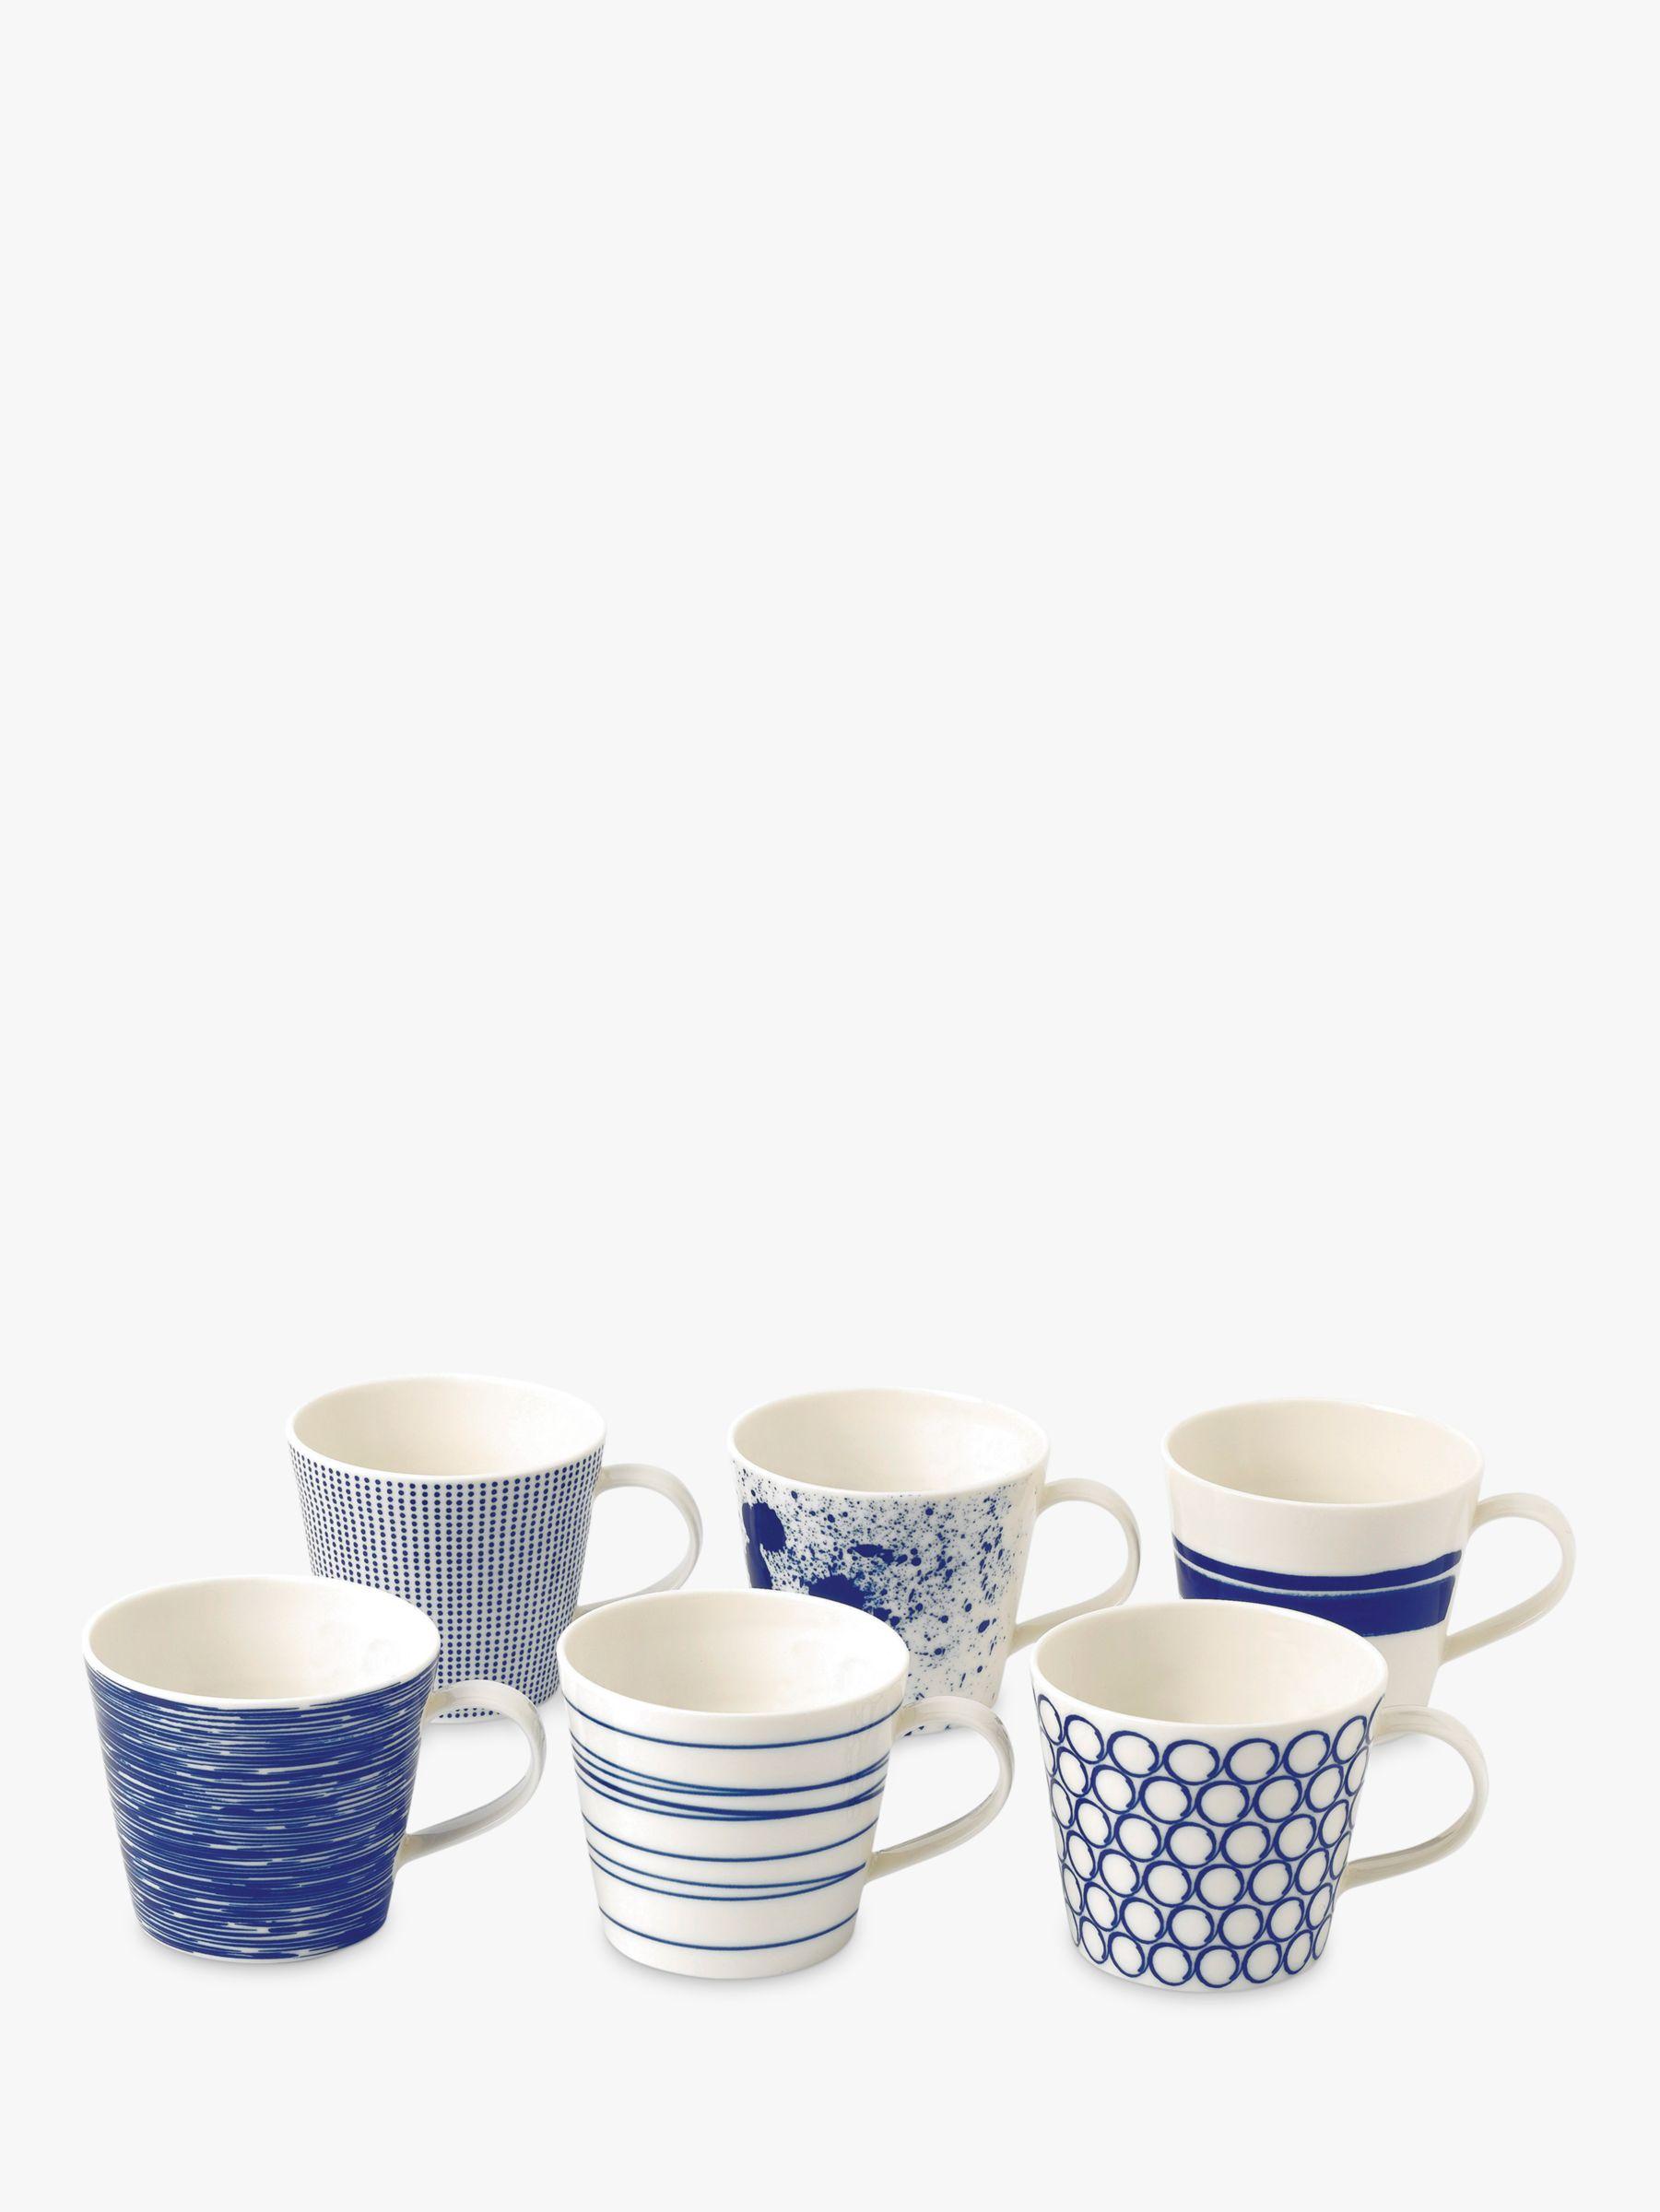 Royal Doulton Royal Doulton Pacific Porcelain Mugs, Set of 6, 390ml, Blue